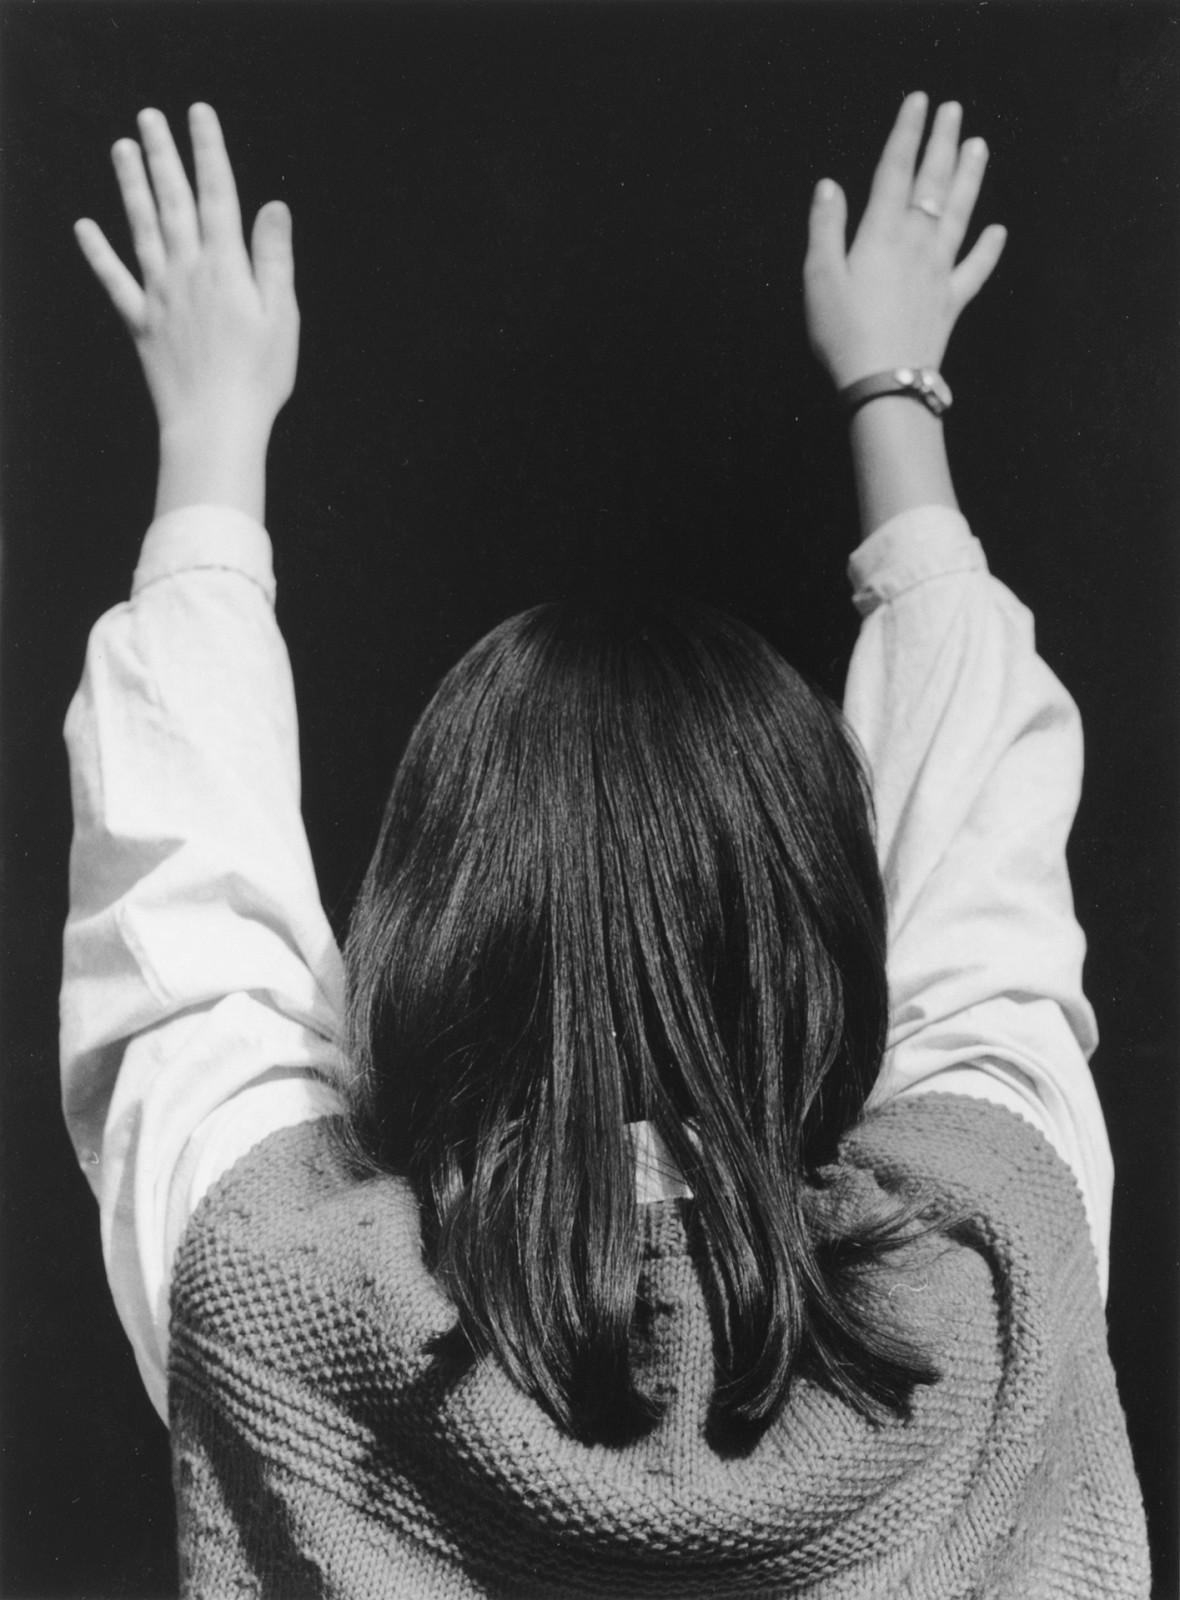 Turi Rapisarda, Mani in alto, 1992 94, serie di 28 fotografie b n, 40 x 30 cm, edizione di 3, courtesy RizzutoGallery